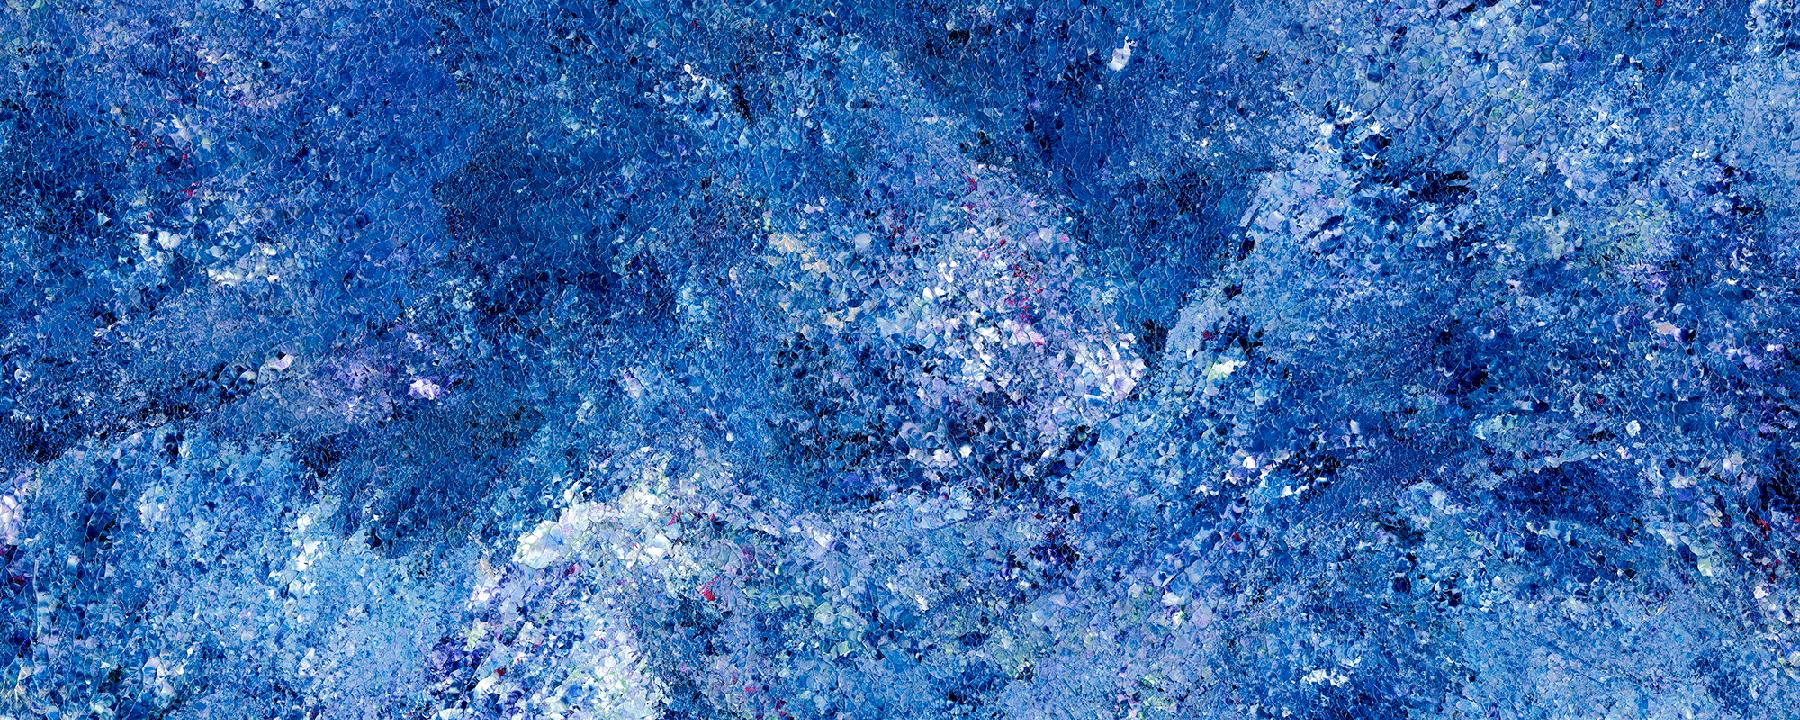 VKI Art - Moondrops